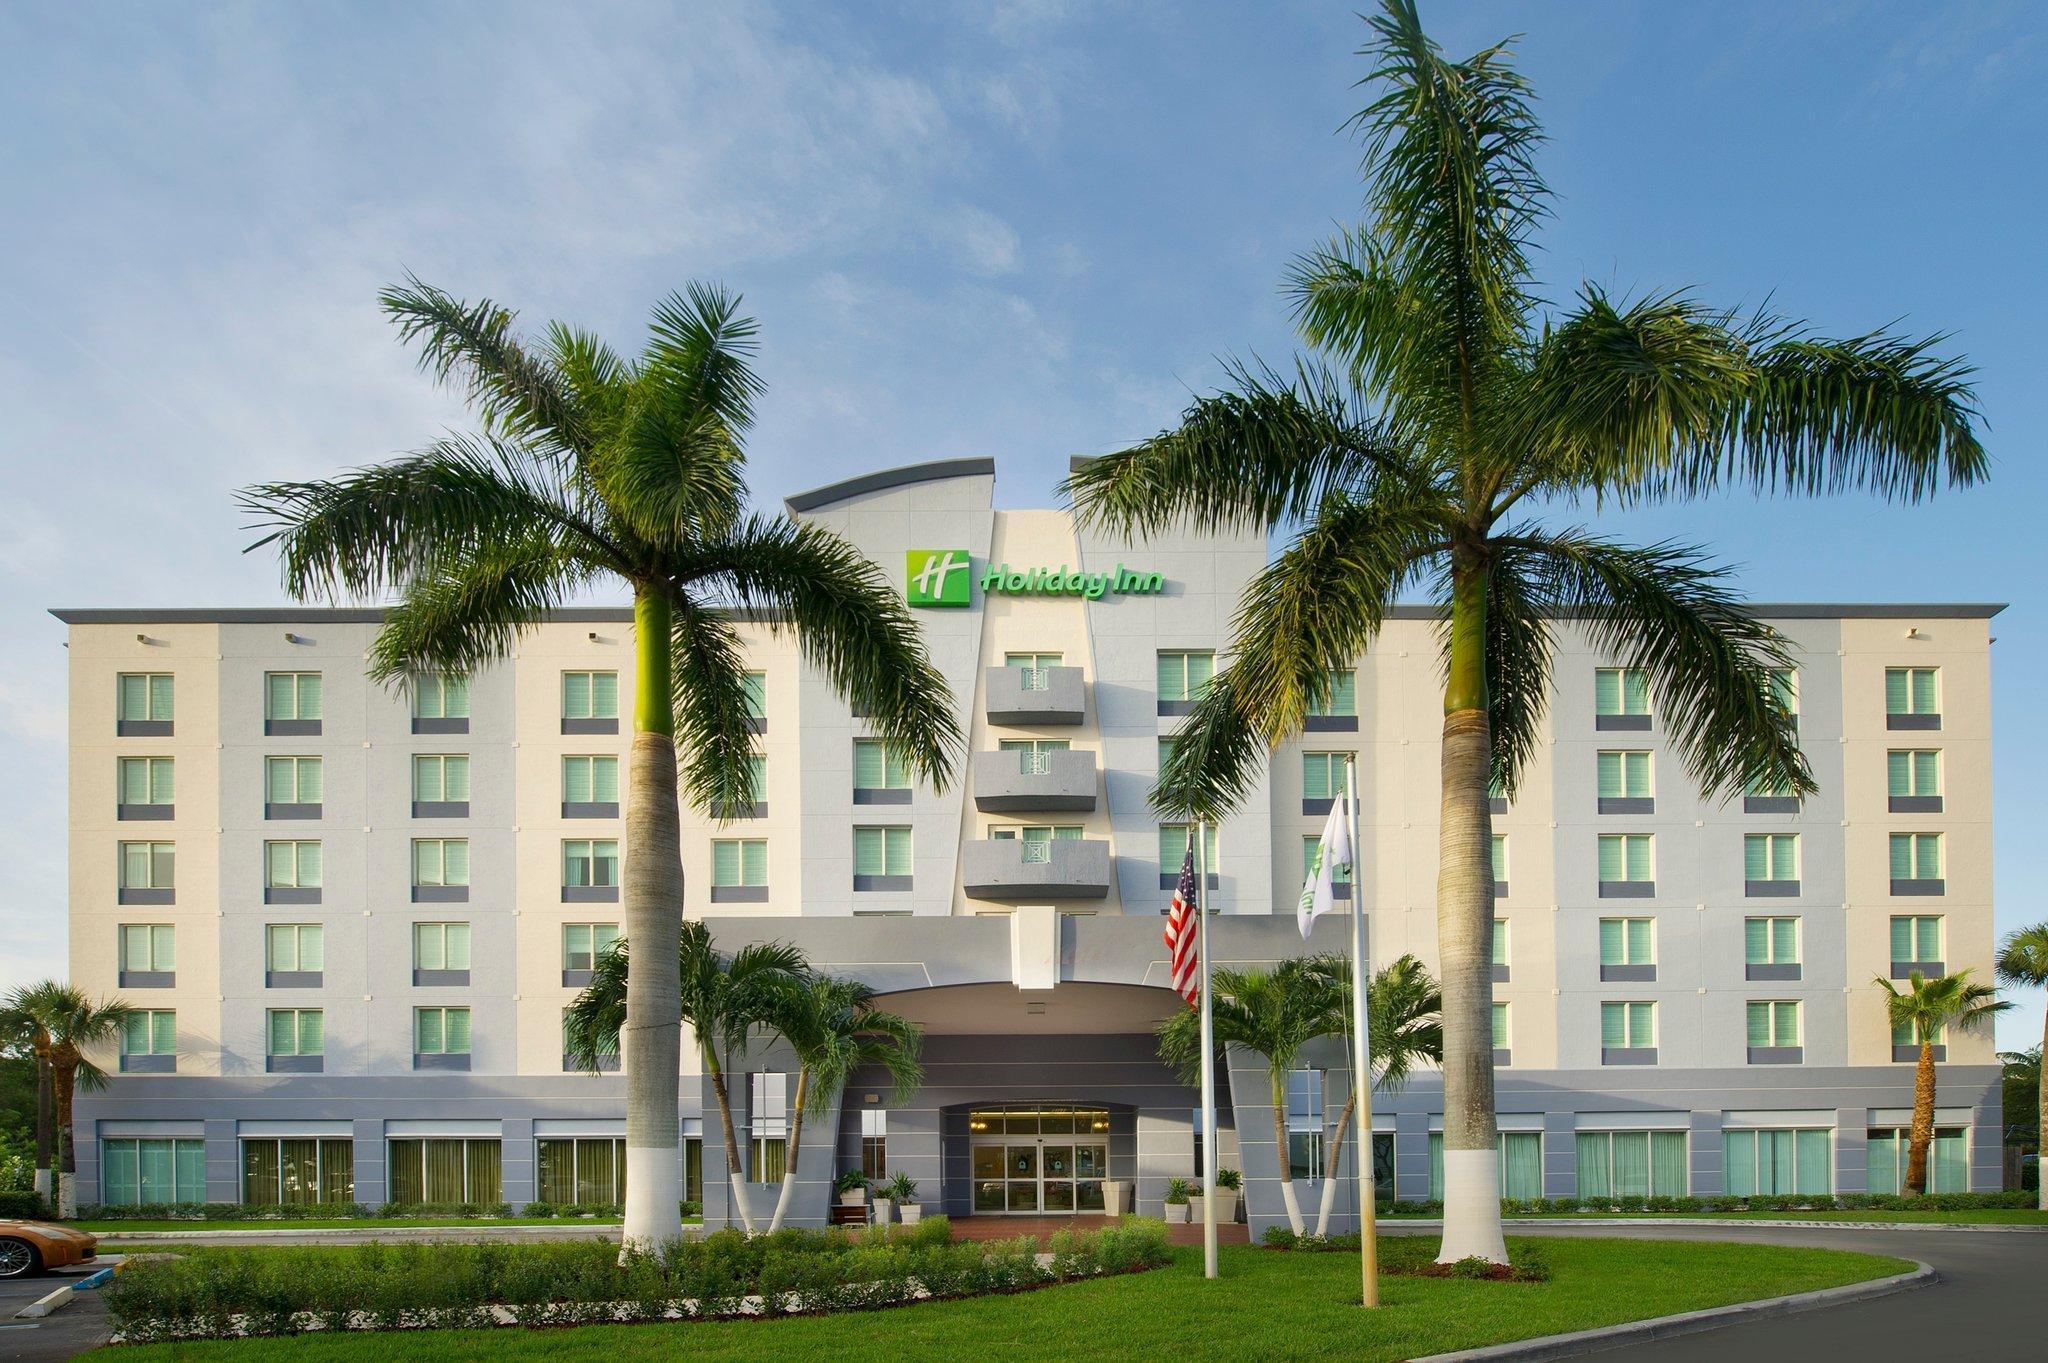 Holiday Inn Hotel Miami Doral Area